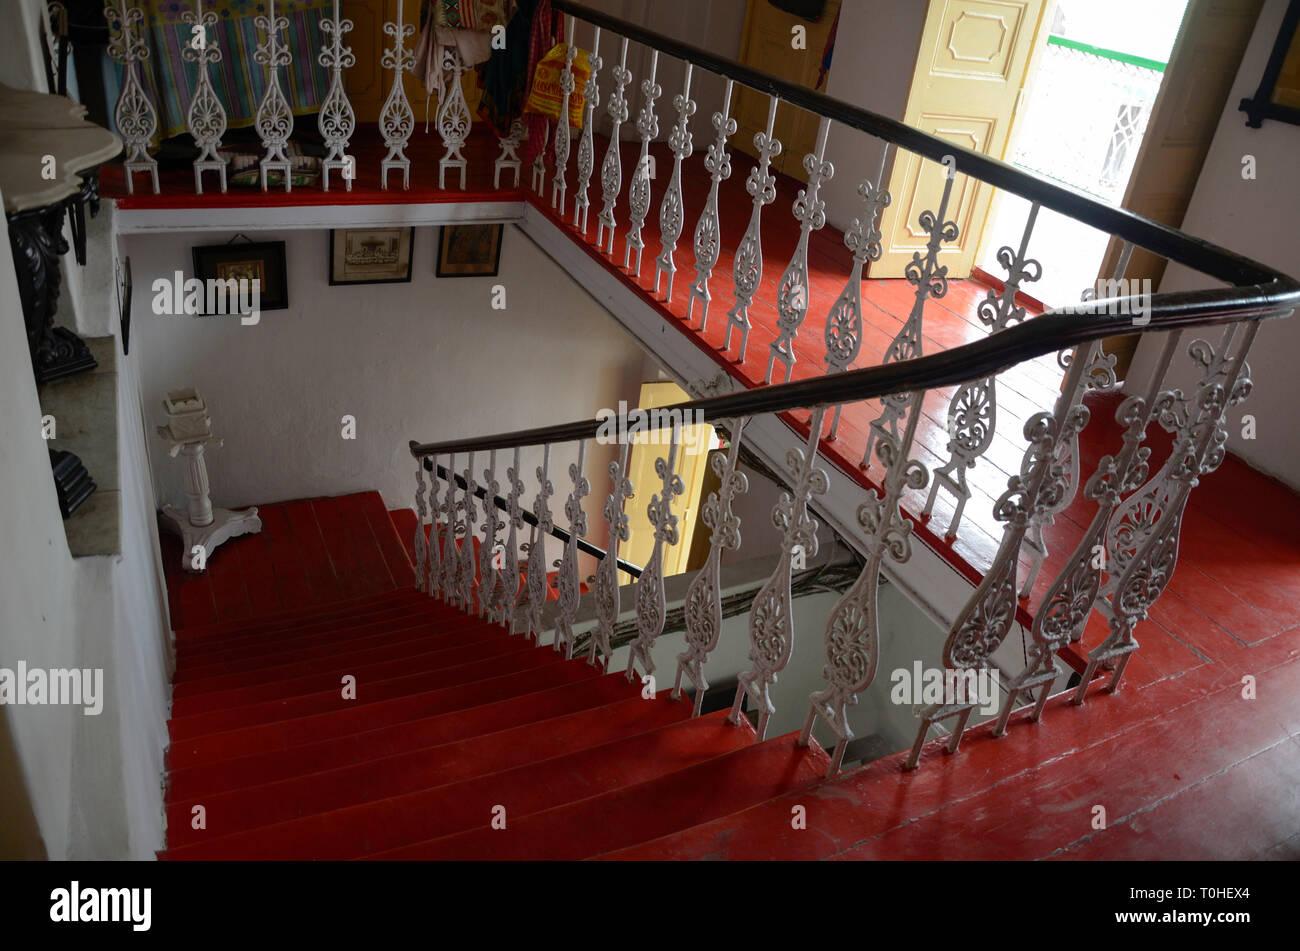 Cast iron railings of stairs, Kolkata, West Bengal, India, Asia - Stock Image